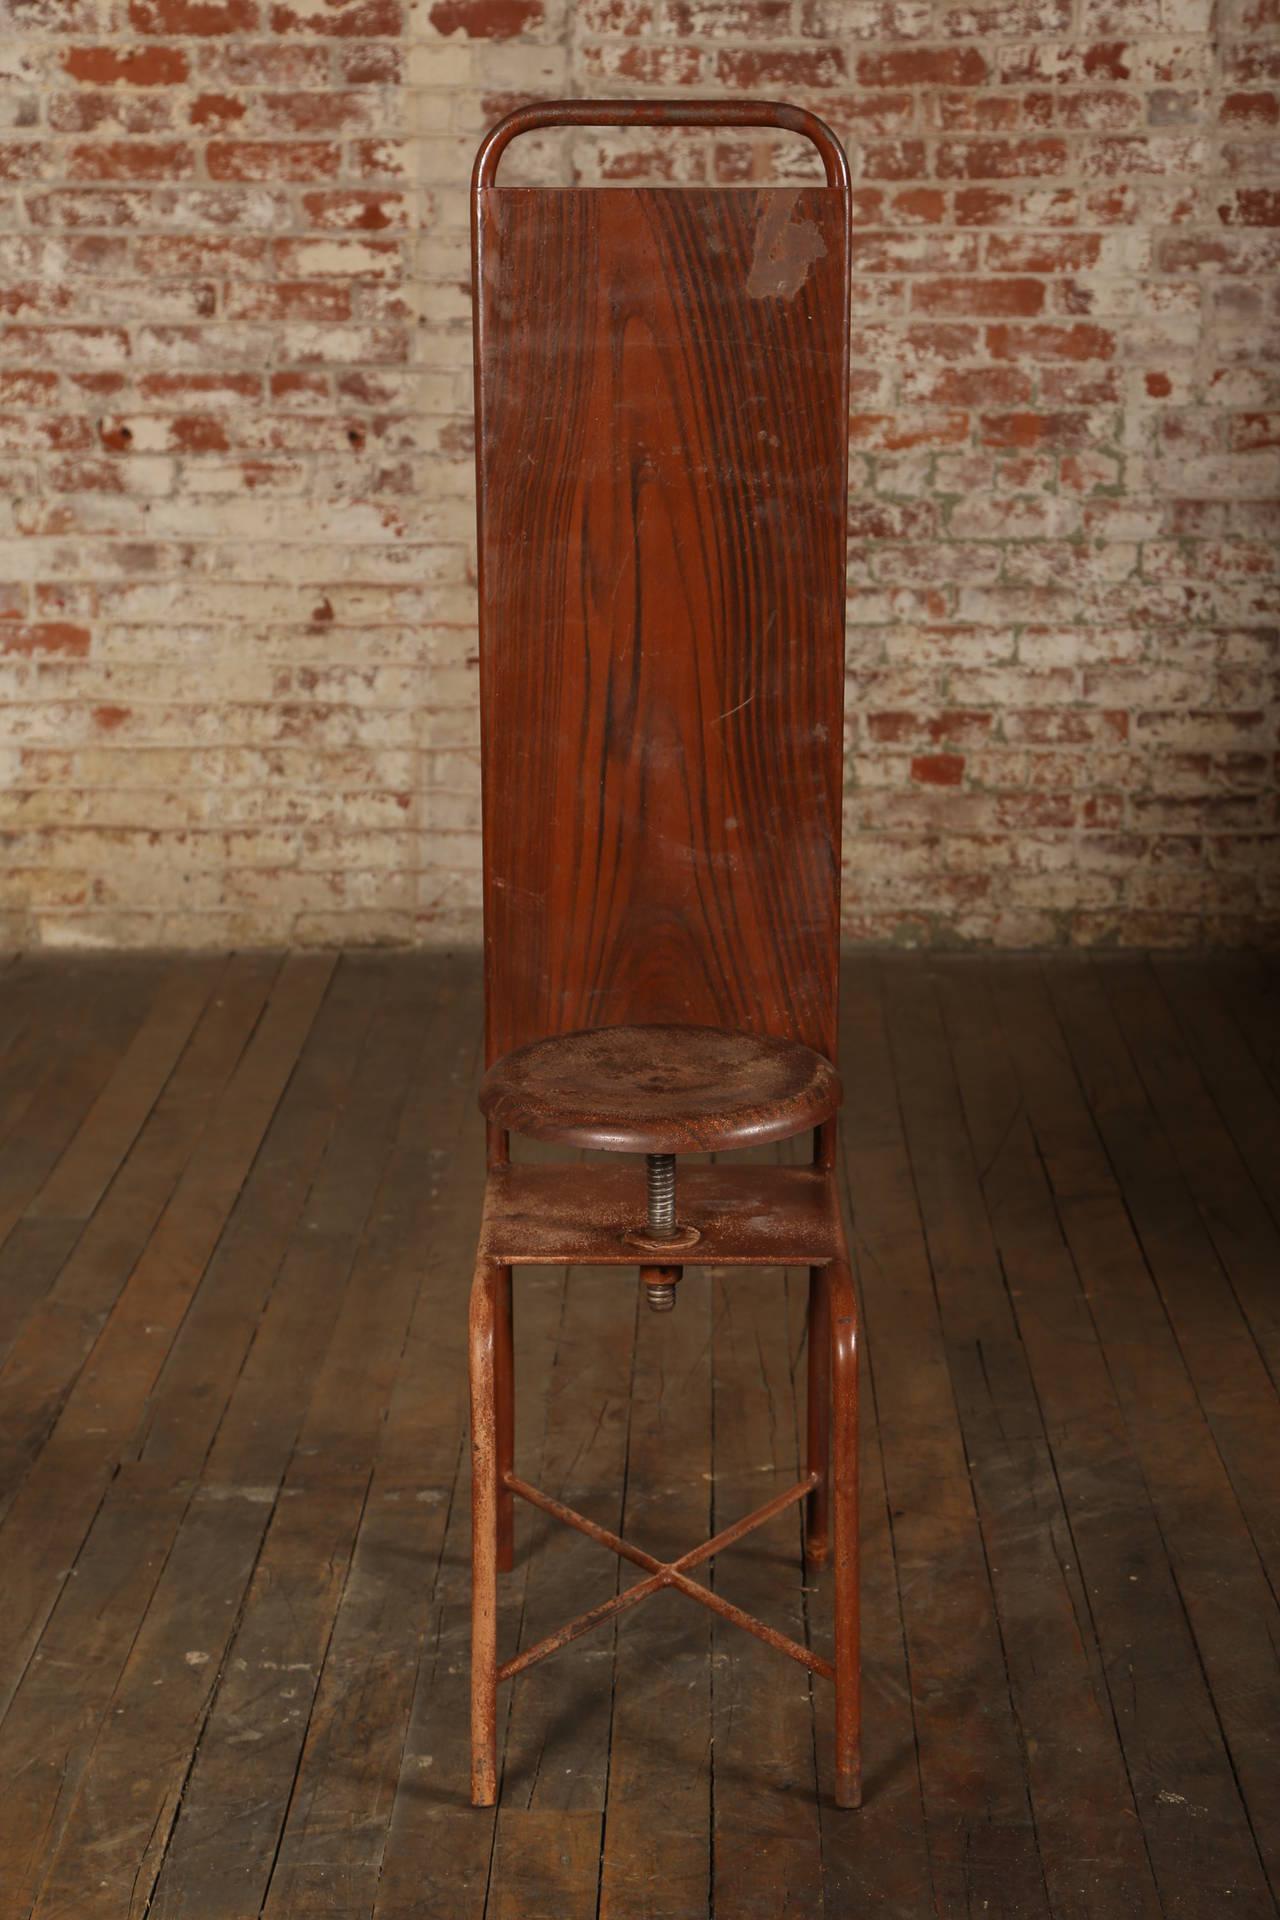 Original, Vintage Adjustable Medical Stool or Chair 3